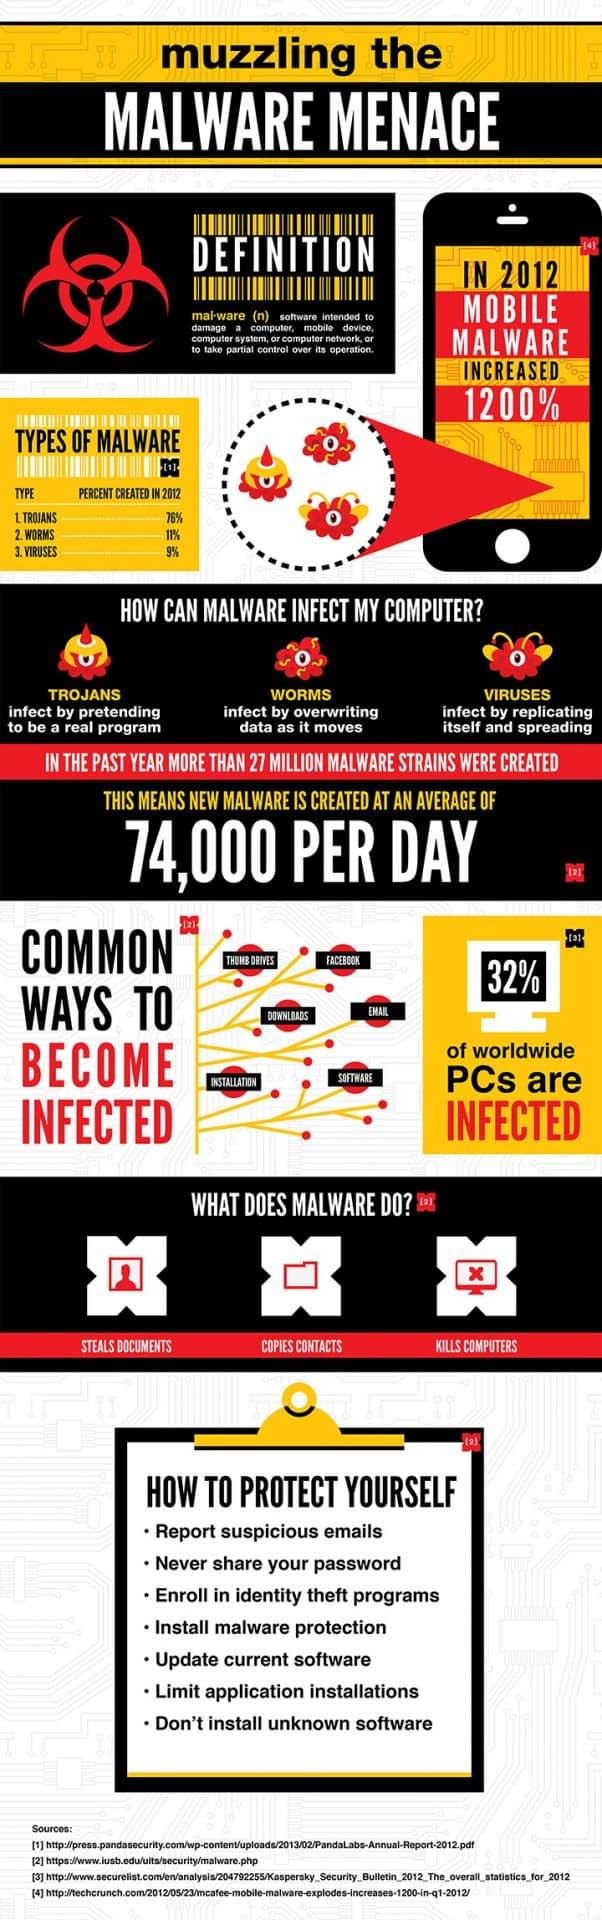 malware-infographic1